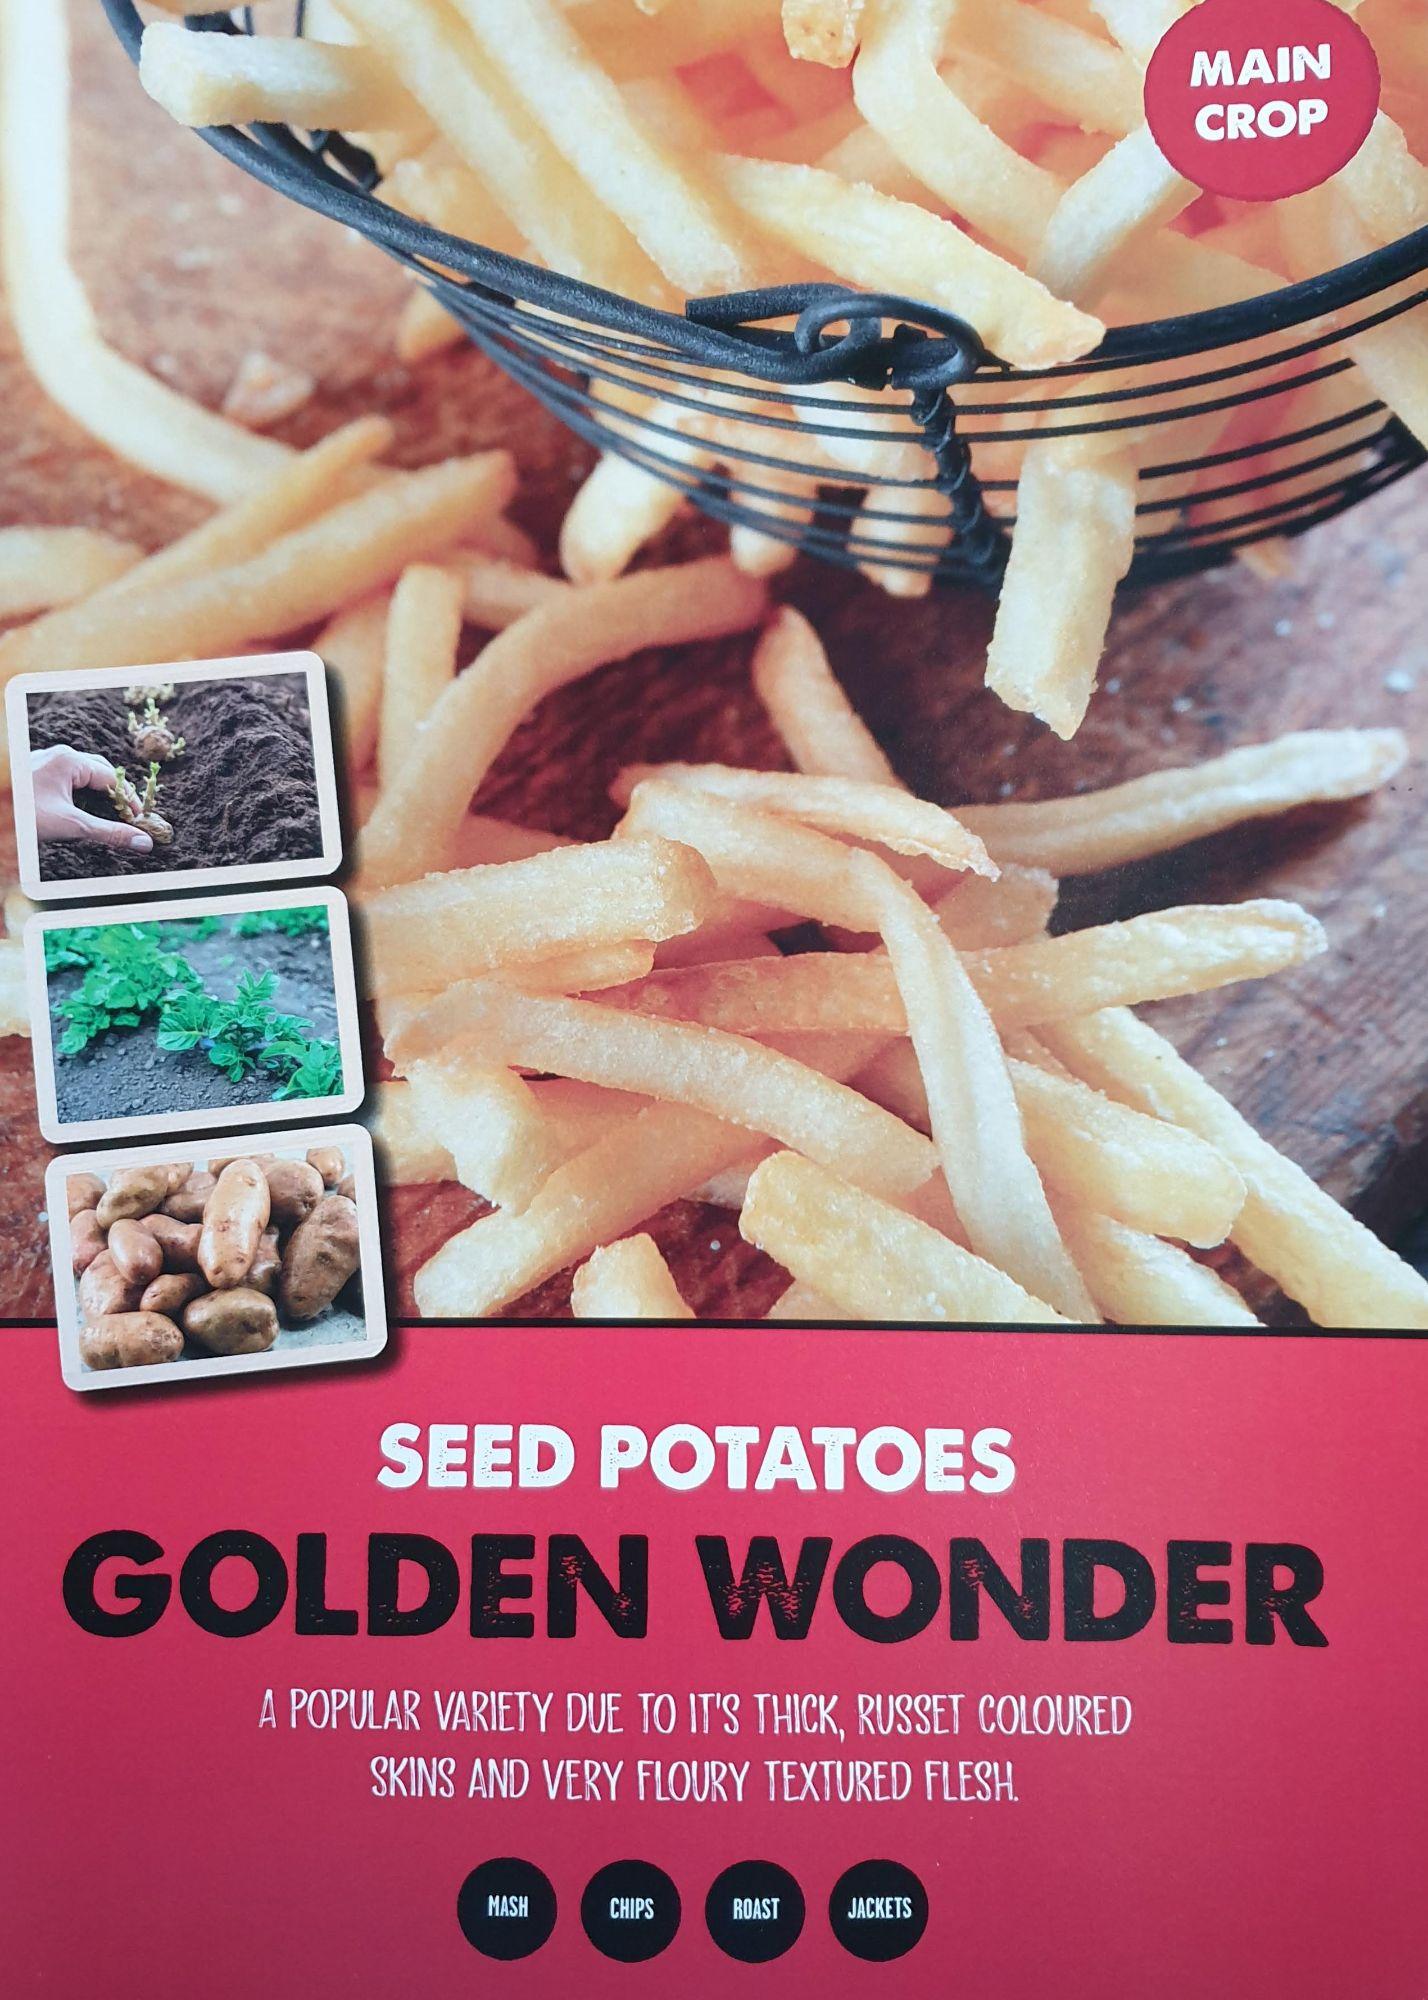 golden_wonder_seed_potato_info.jpg